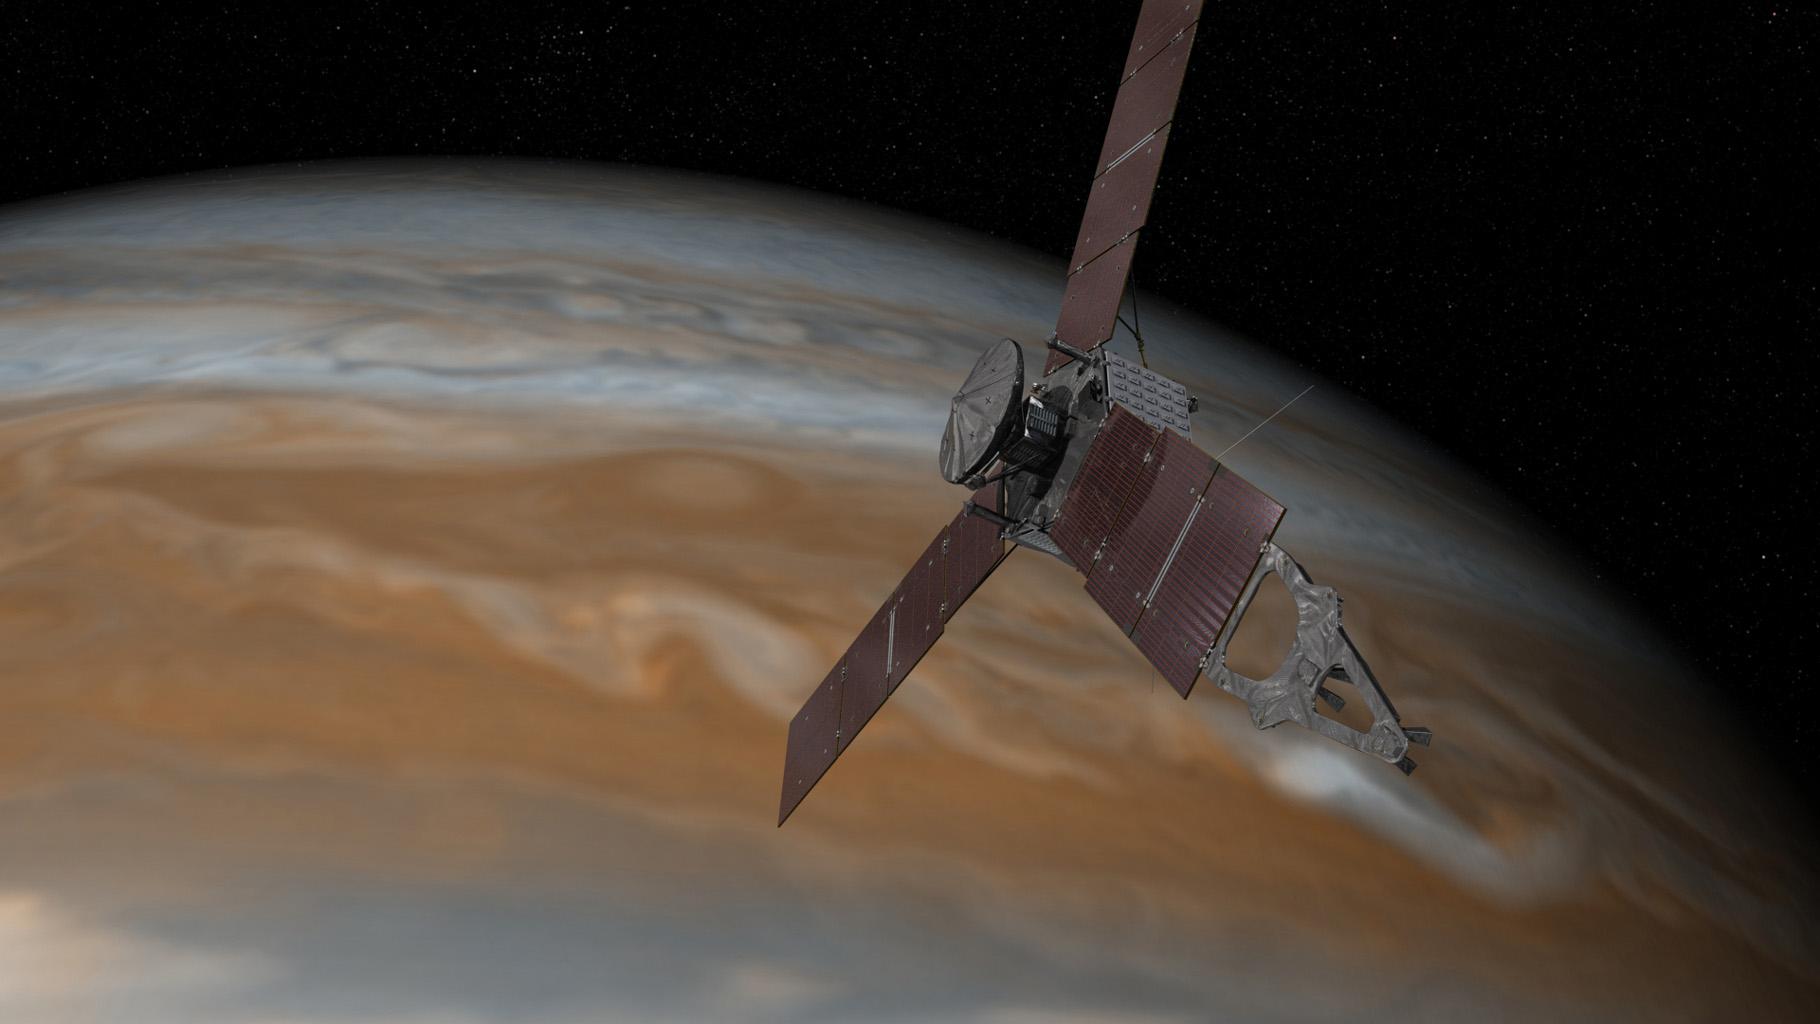 NASA's Jupiter Probe Back in Action After Glitch